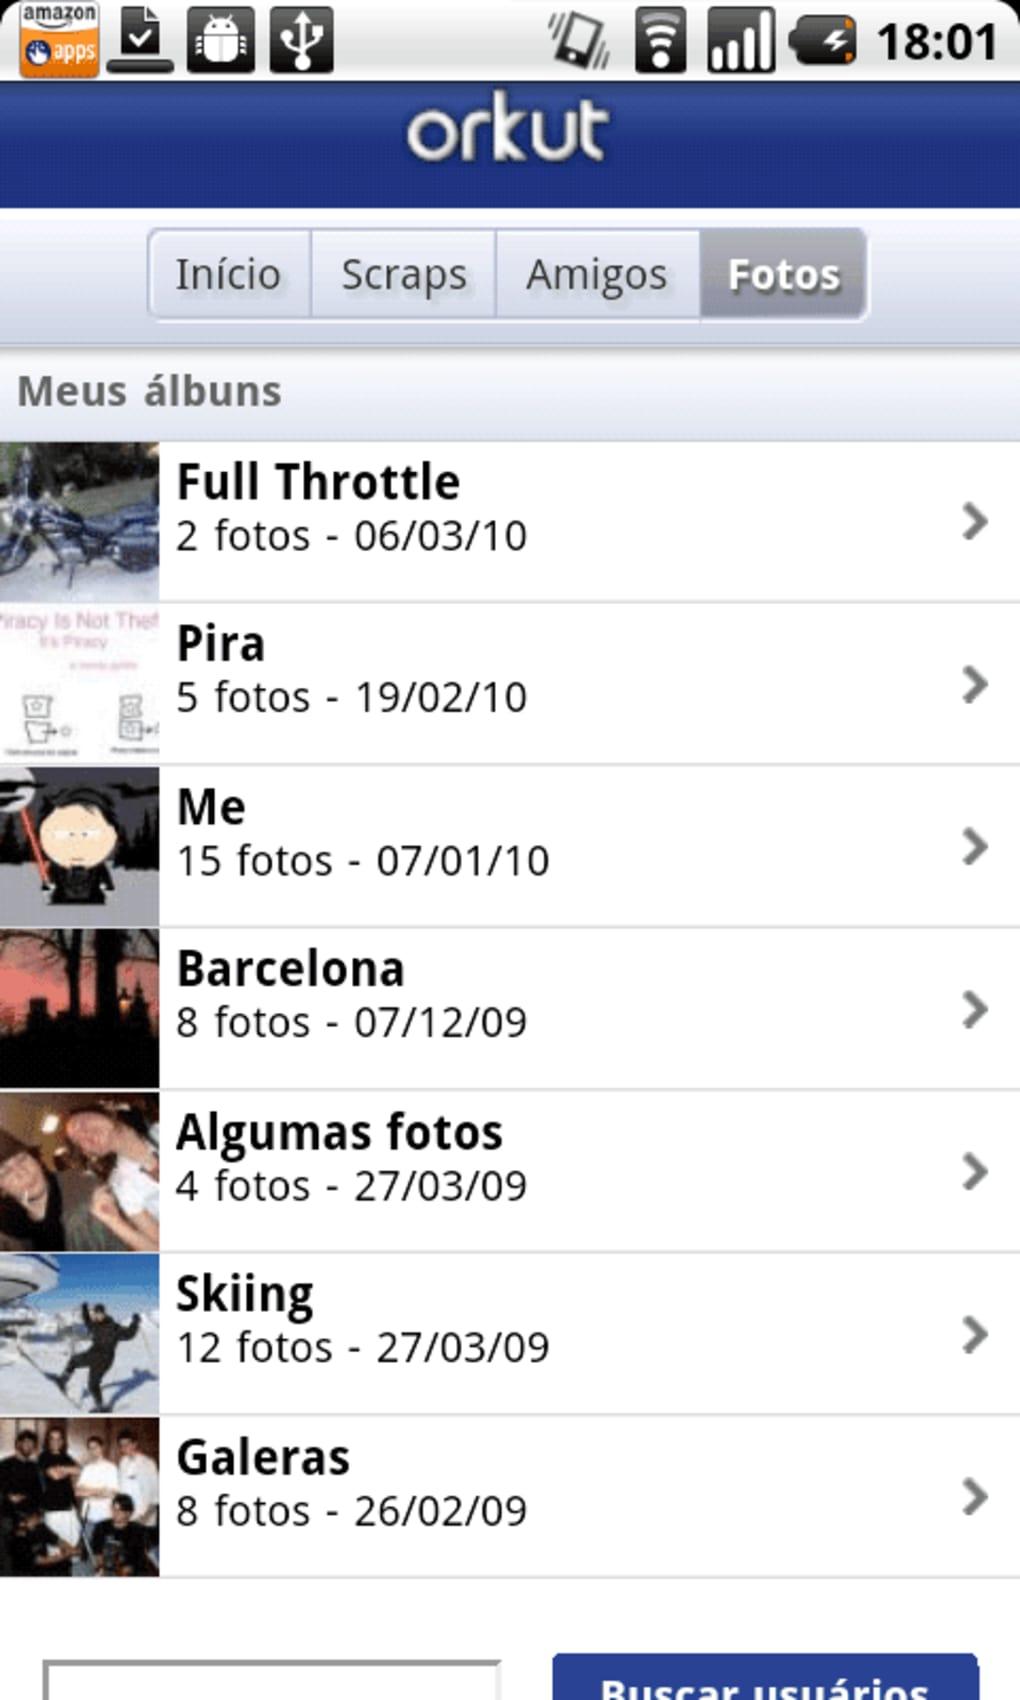 Como desbloquear fotos do orkut 2011 59